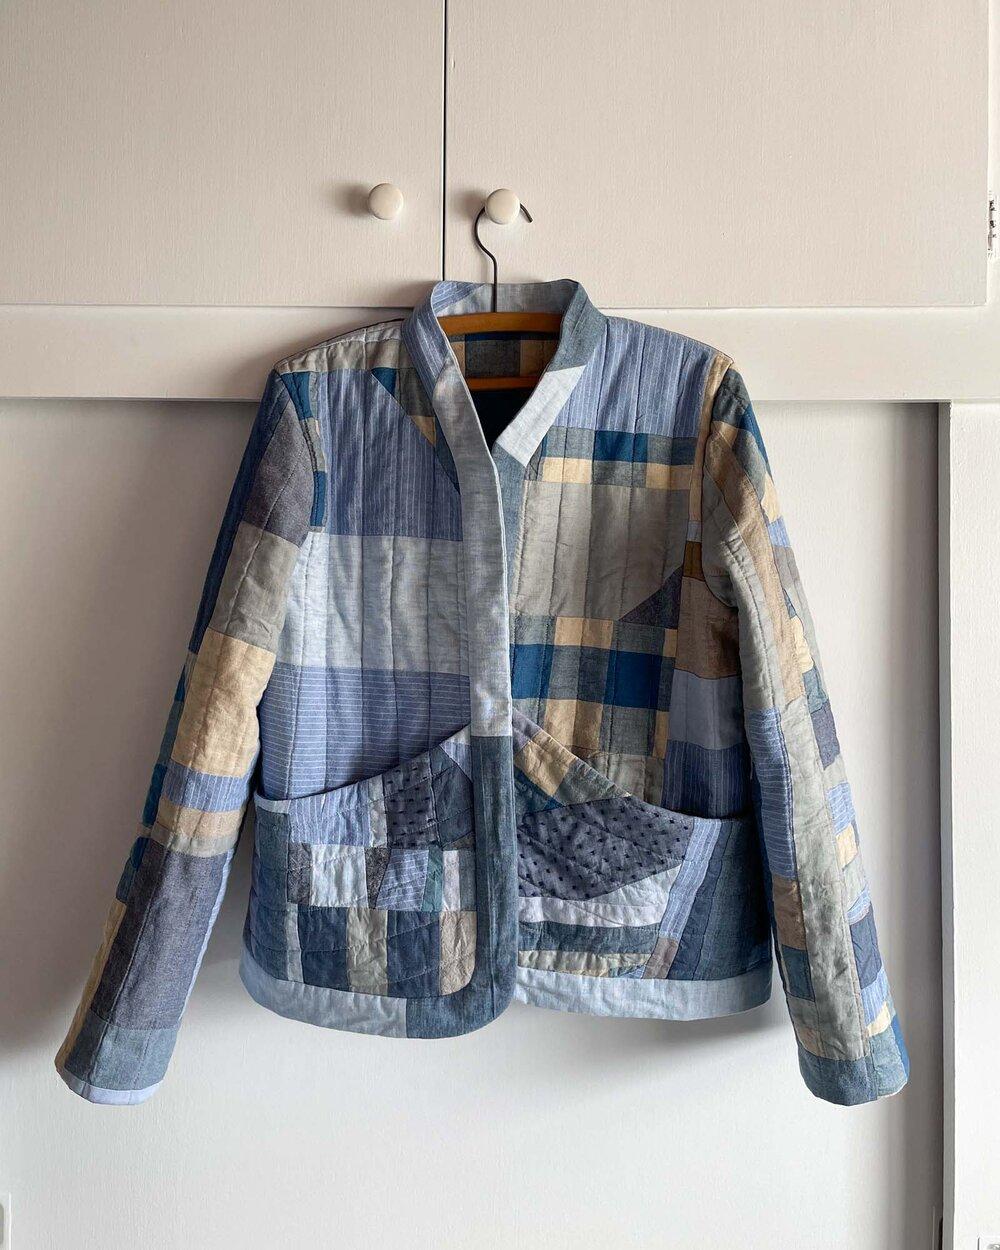 DIY Improv Quilt Coat by Sew DIY